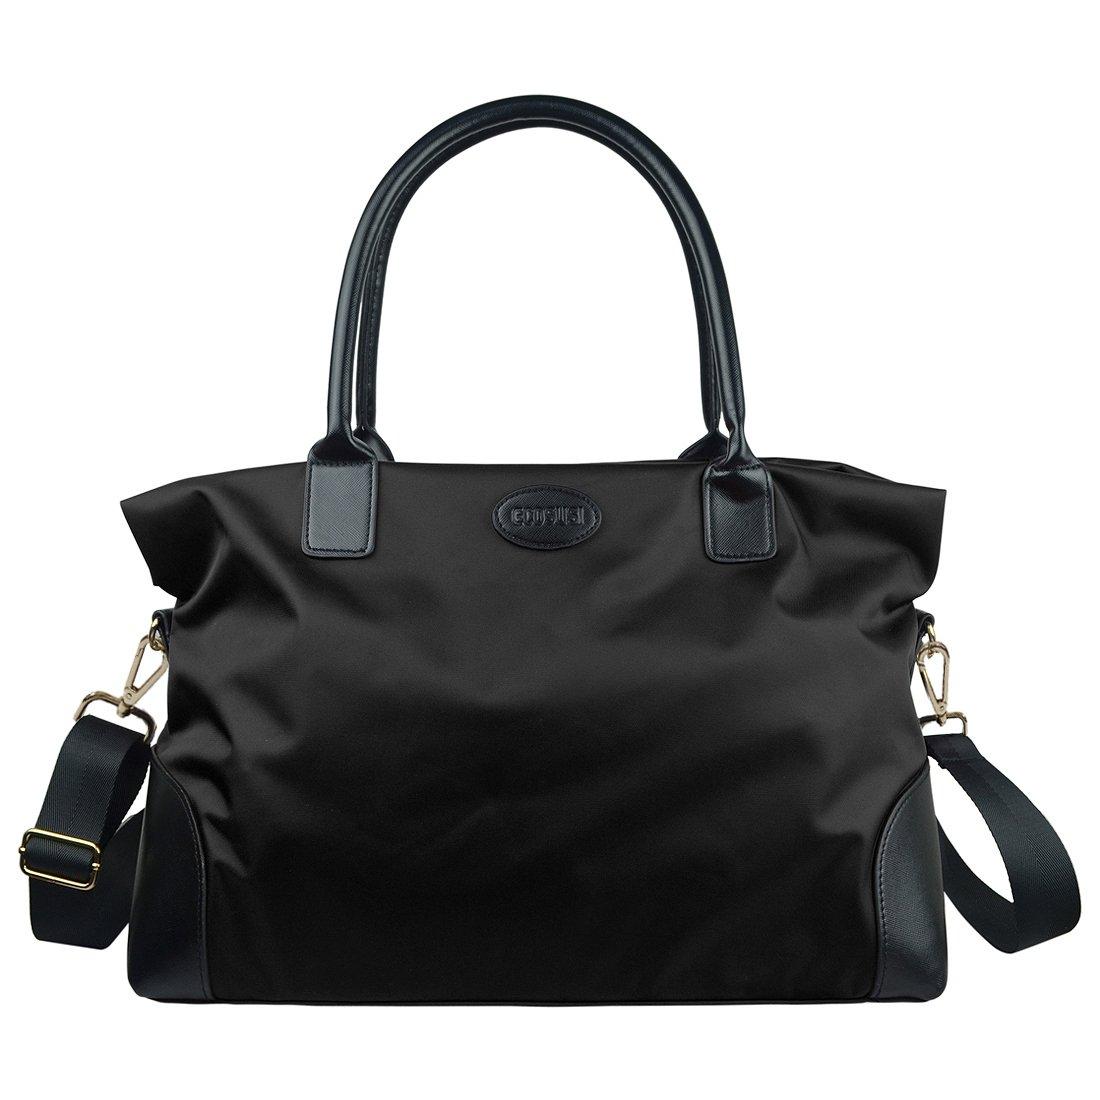 ECOSUSI Unisex Large Travel Weekender Bag Duffle Bag Gym Totes in Trolley Handle, Black by ECOSUSI